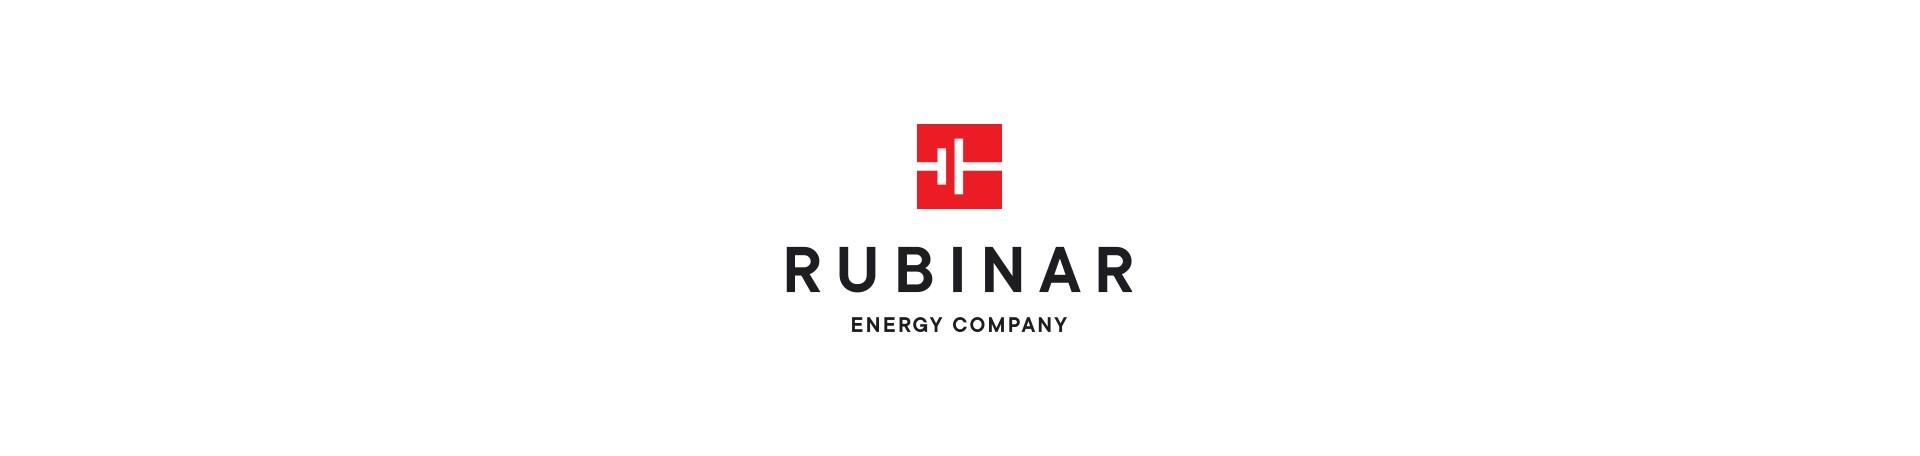 Rubinar - Energy Company